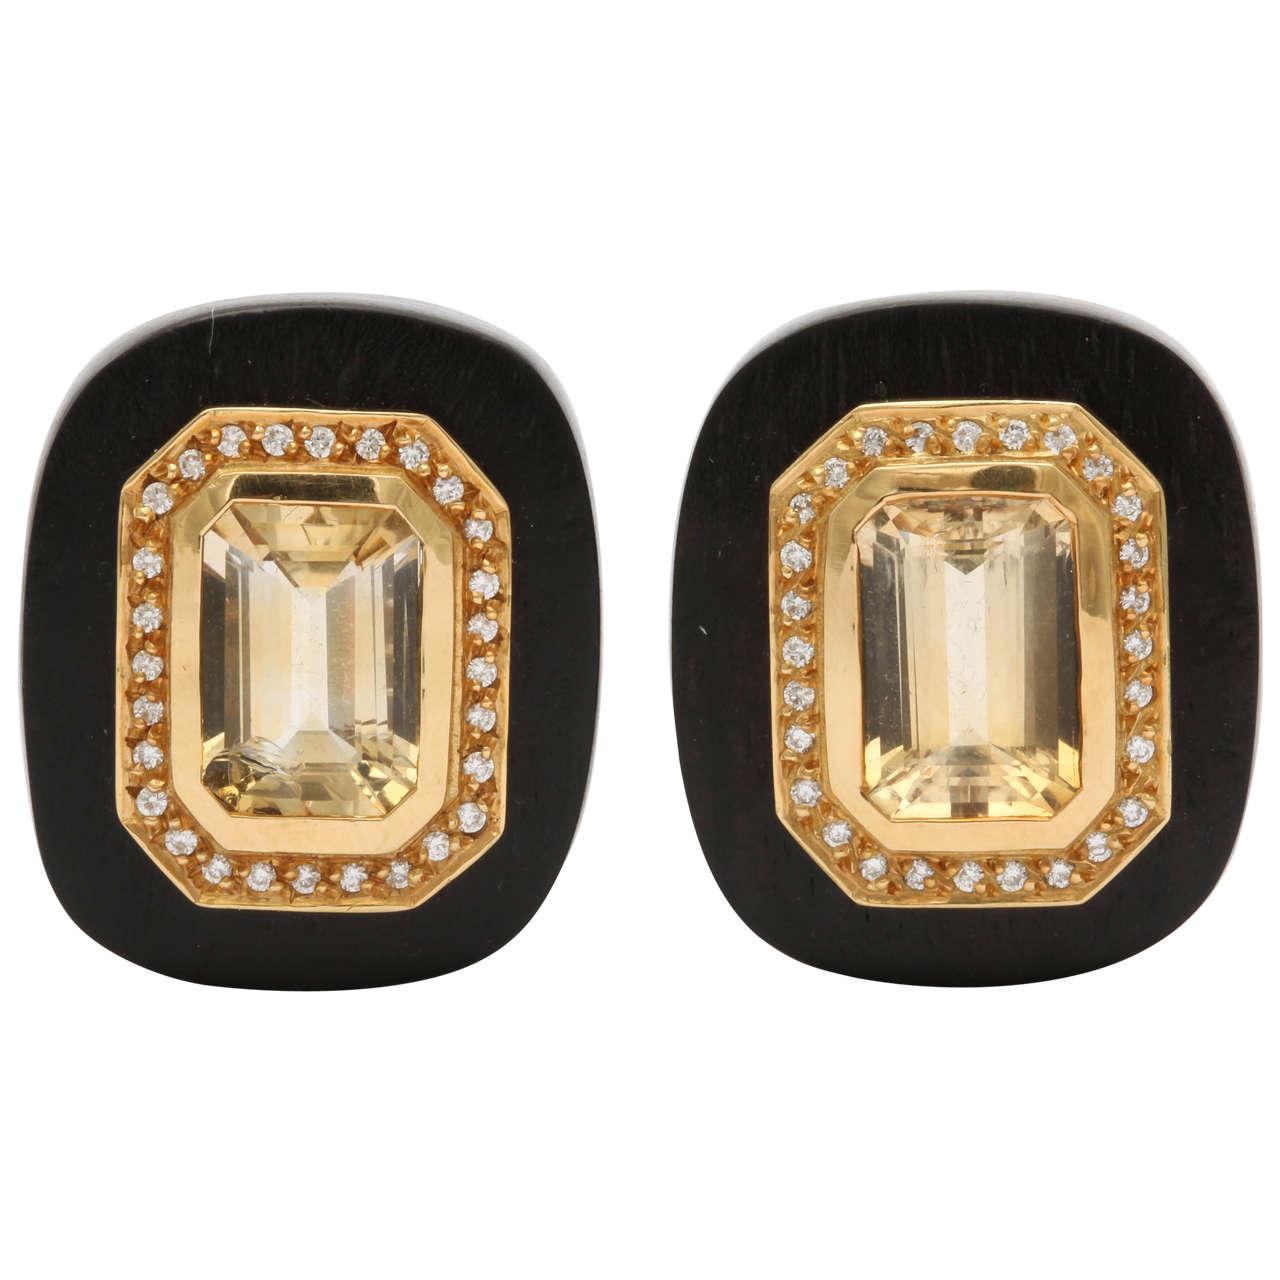 L'Oree du Bois Wood Citrine Diamond Earrings